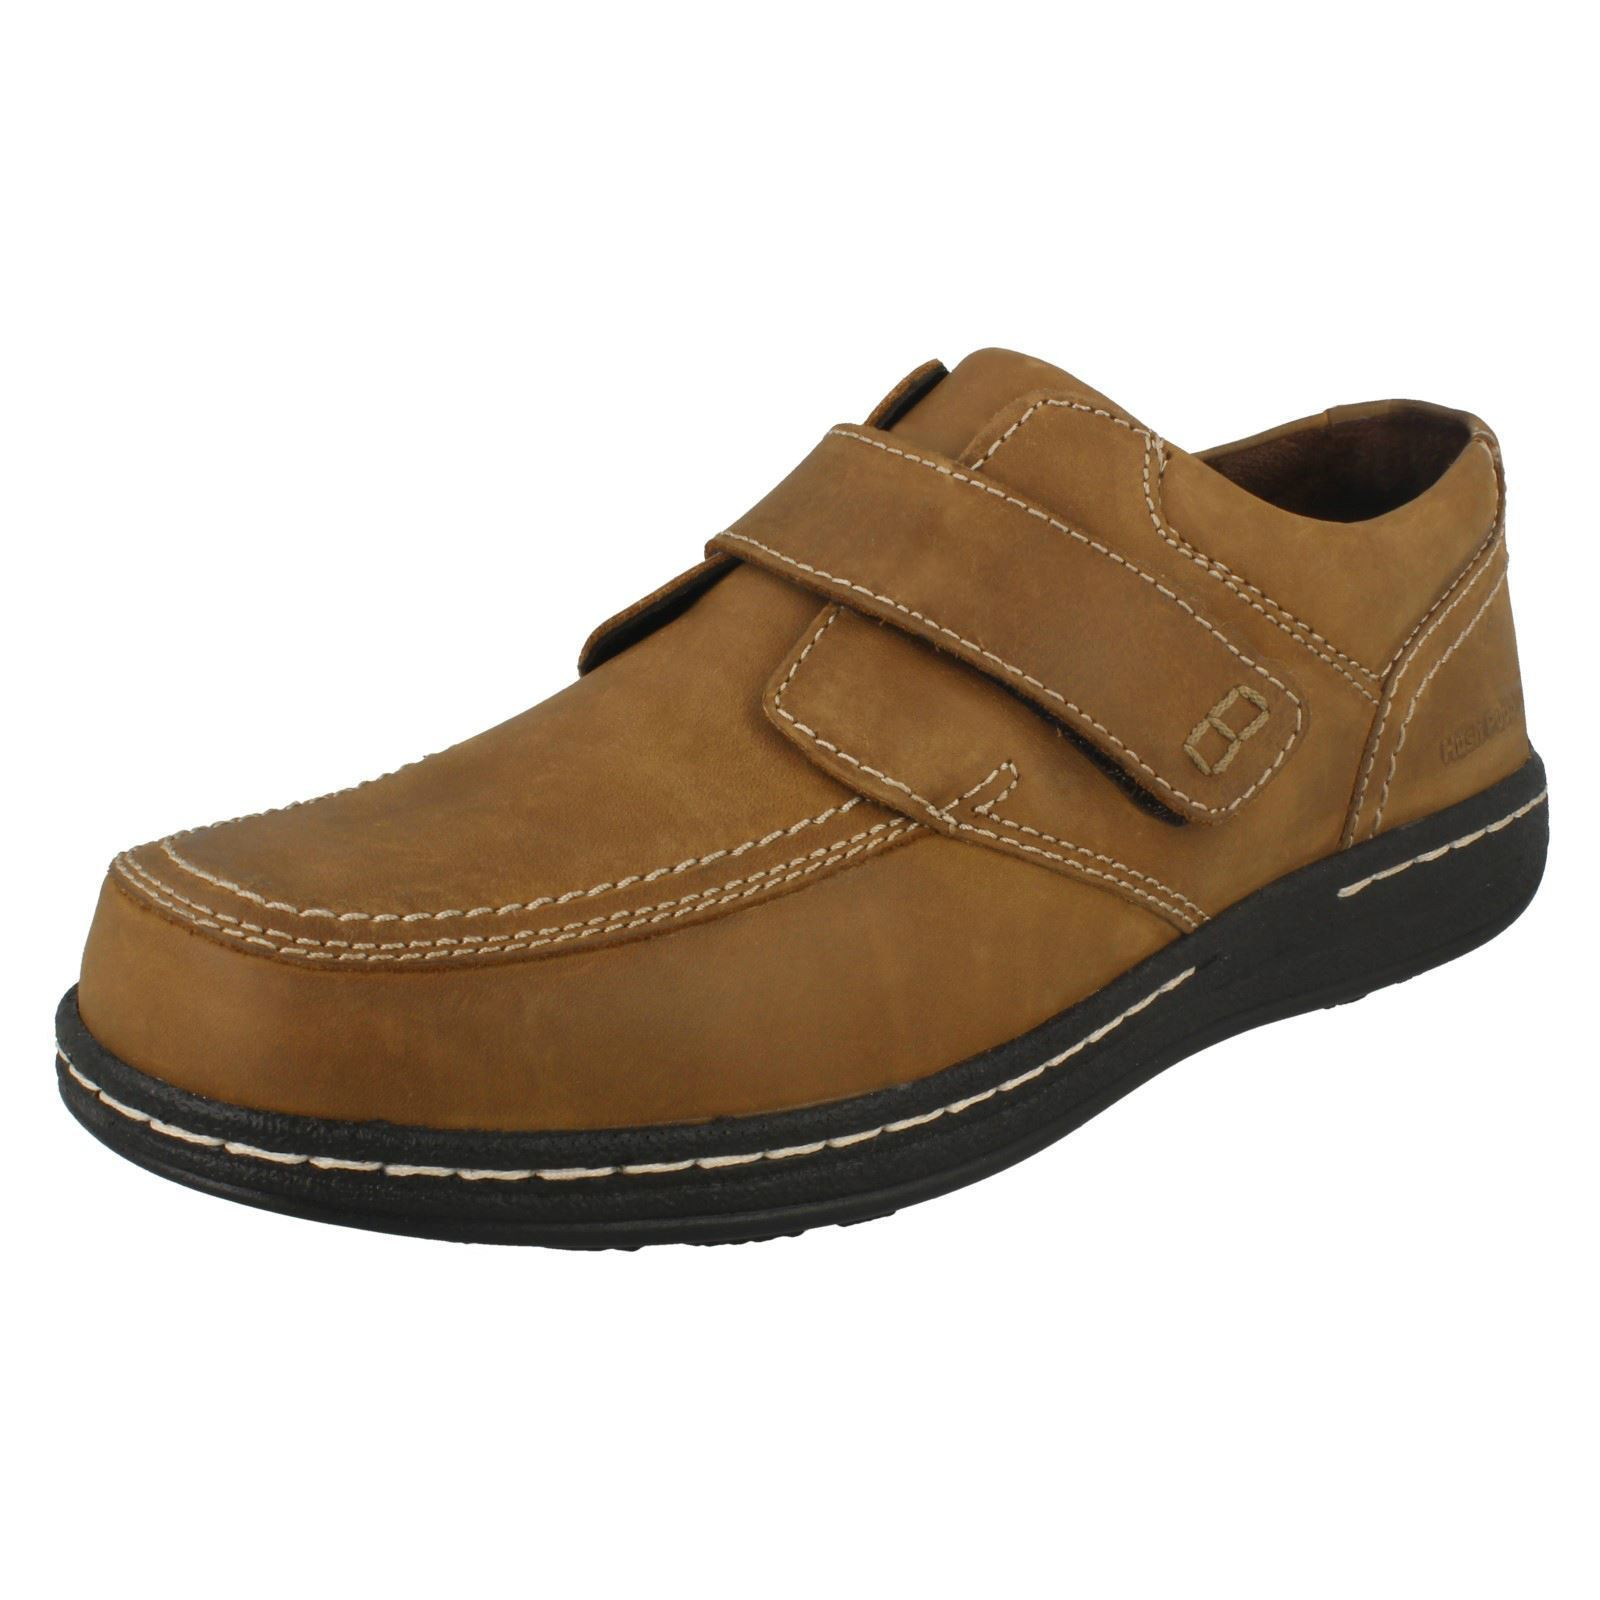 Herren Hush Puppies Hook & Loop Style Strap Schuhe The Style Loop Vince Victory  N 0a5d81